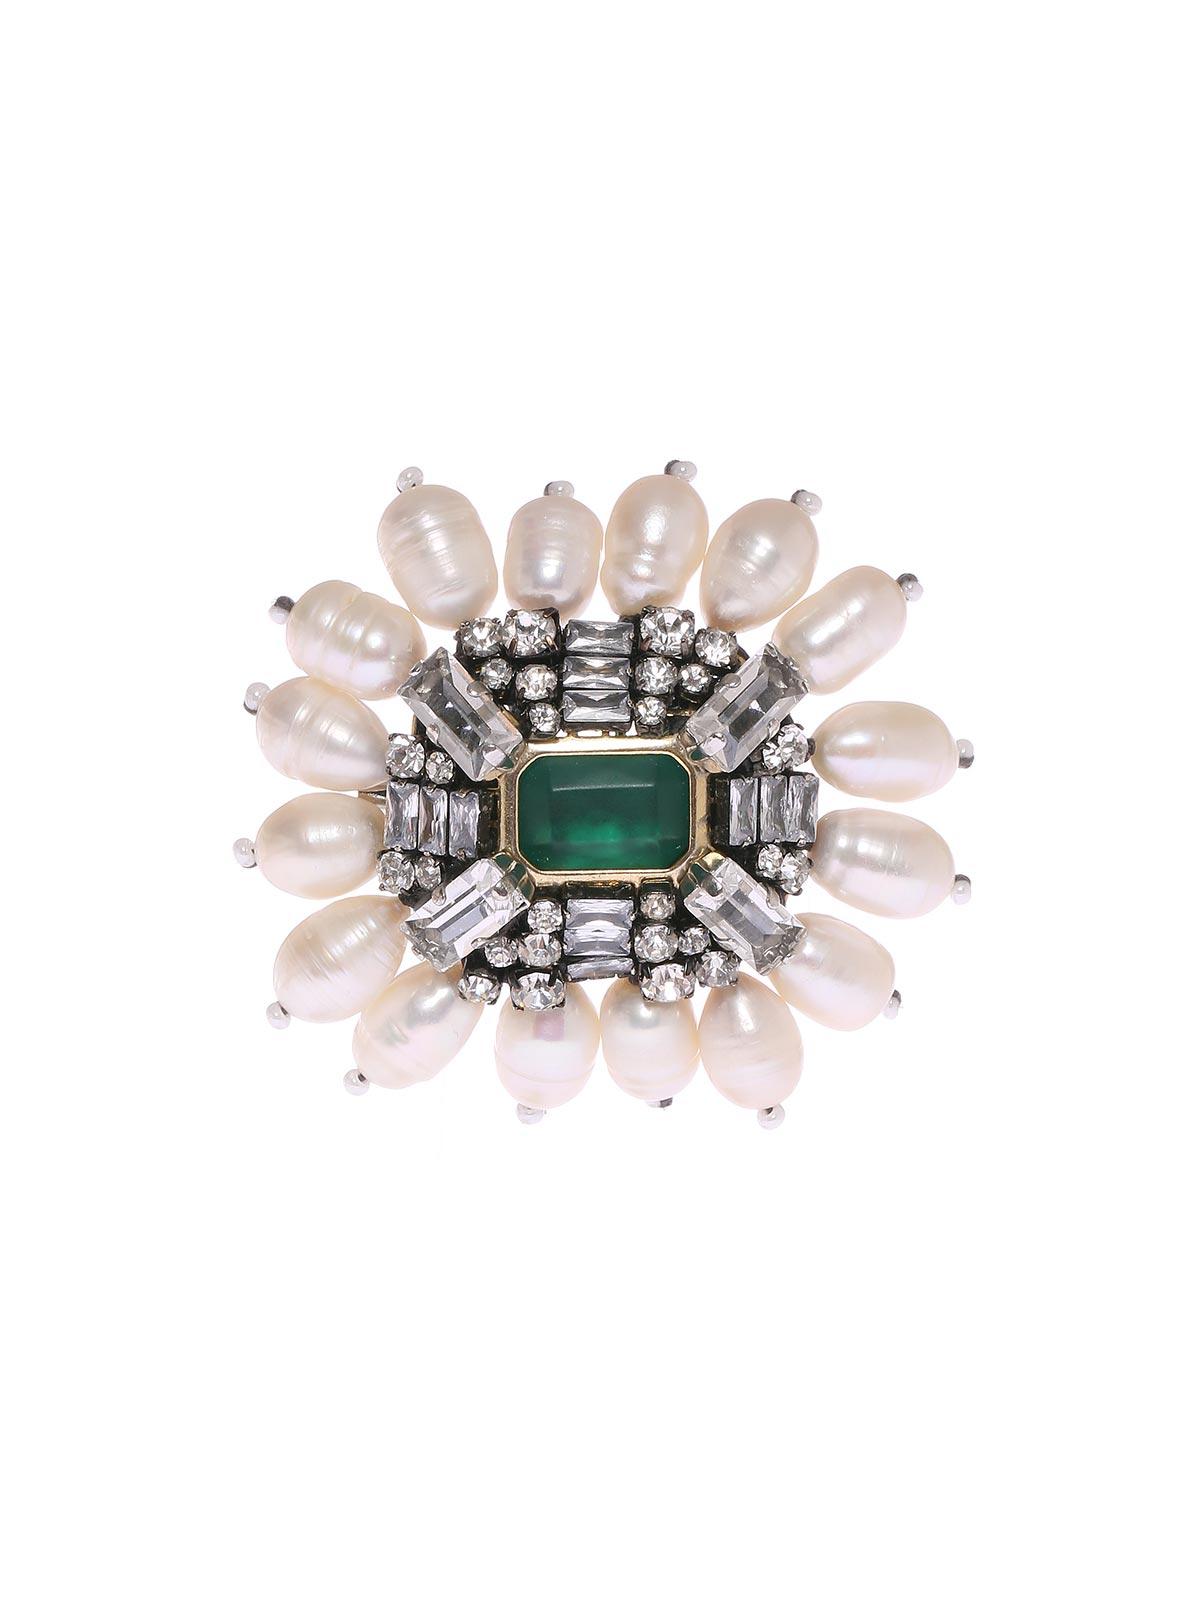 Jewel brooch